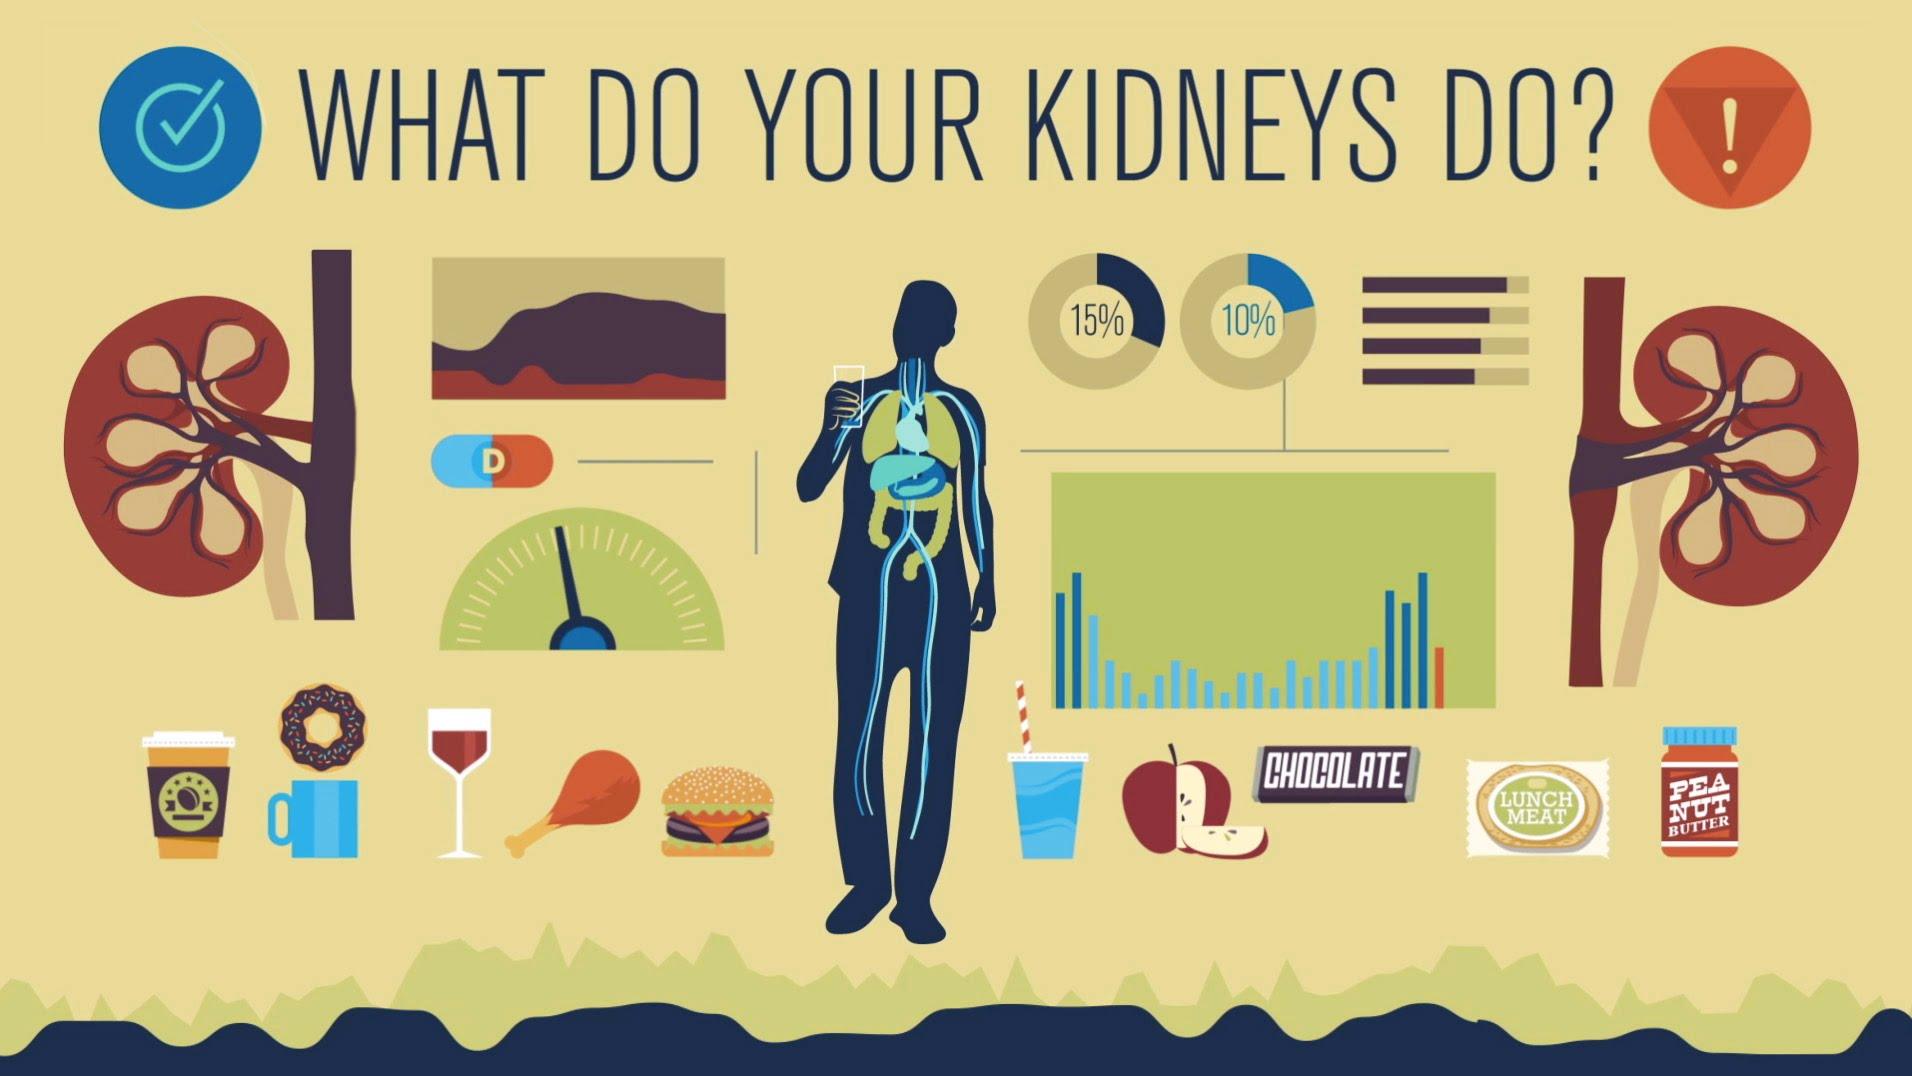 A Ted Ed Animation Explaining How The Human Kidneys Work